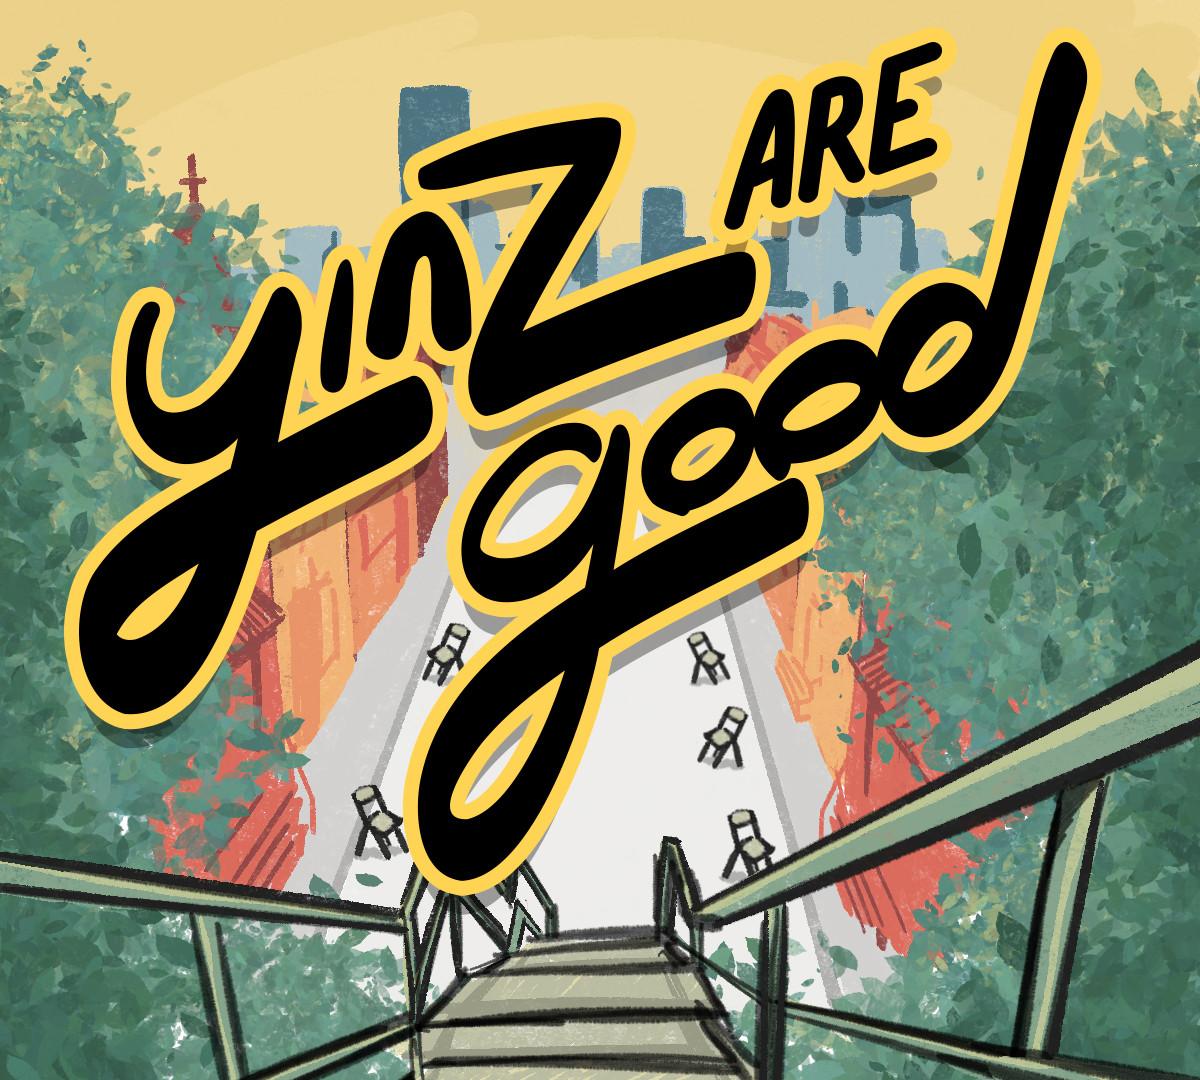 yinz_are_good-host.jpg